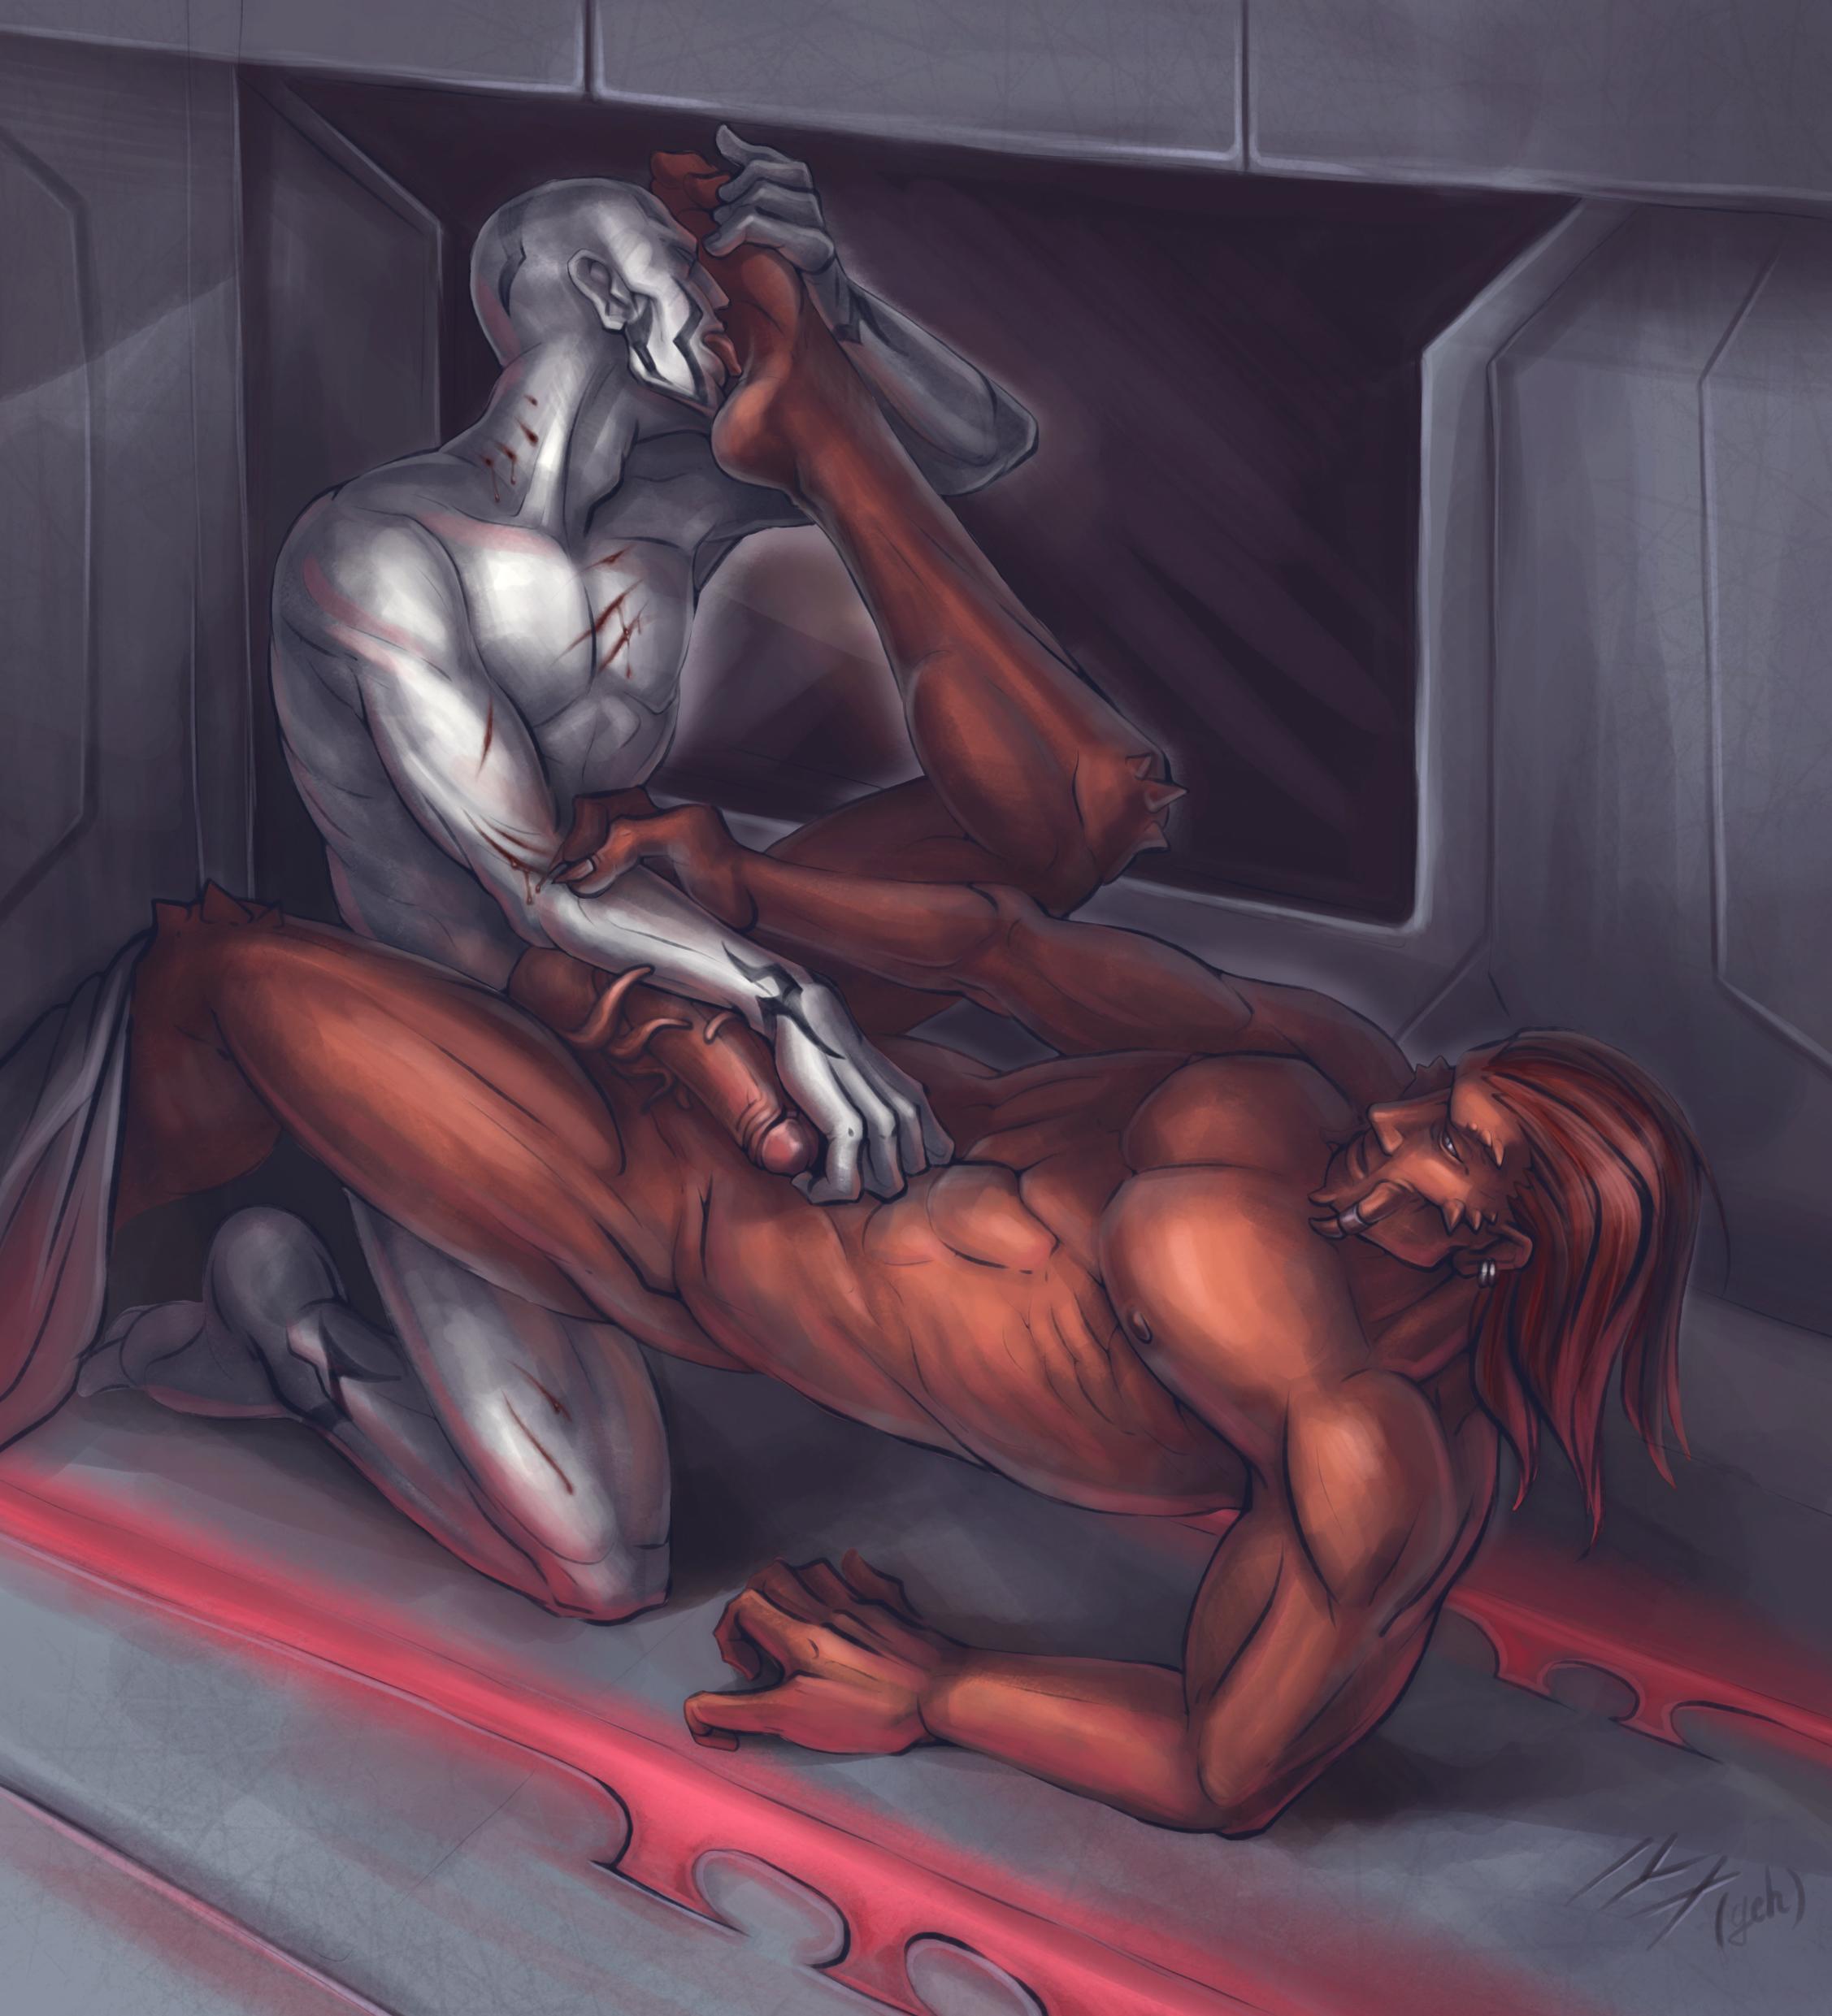 gey-porno-zvezdnie-voyni